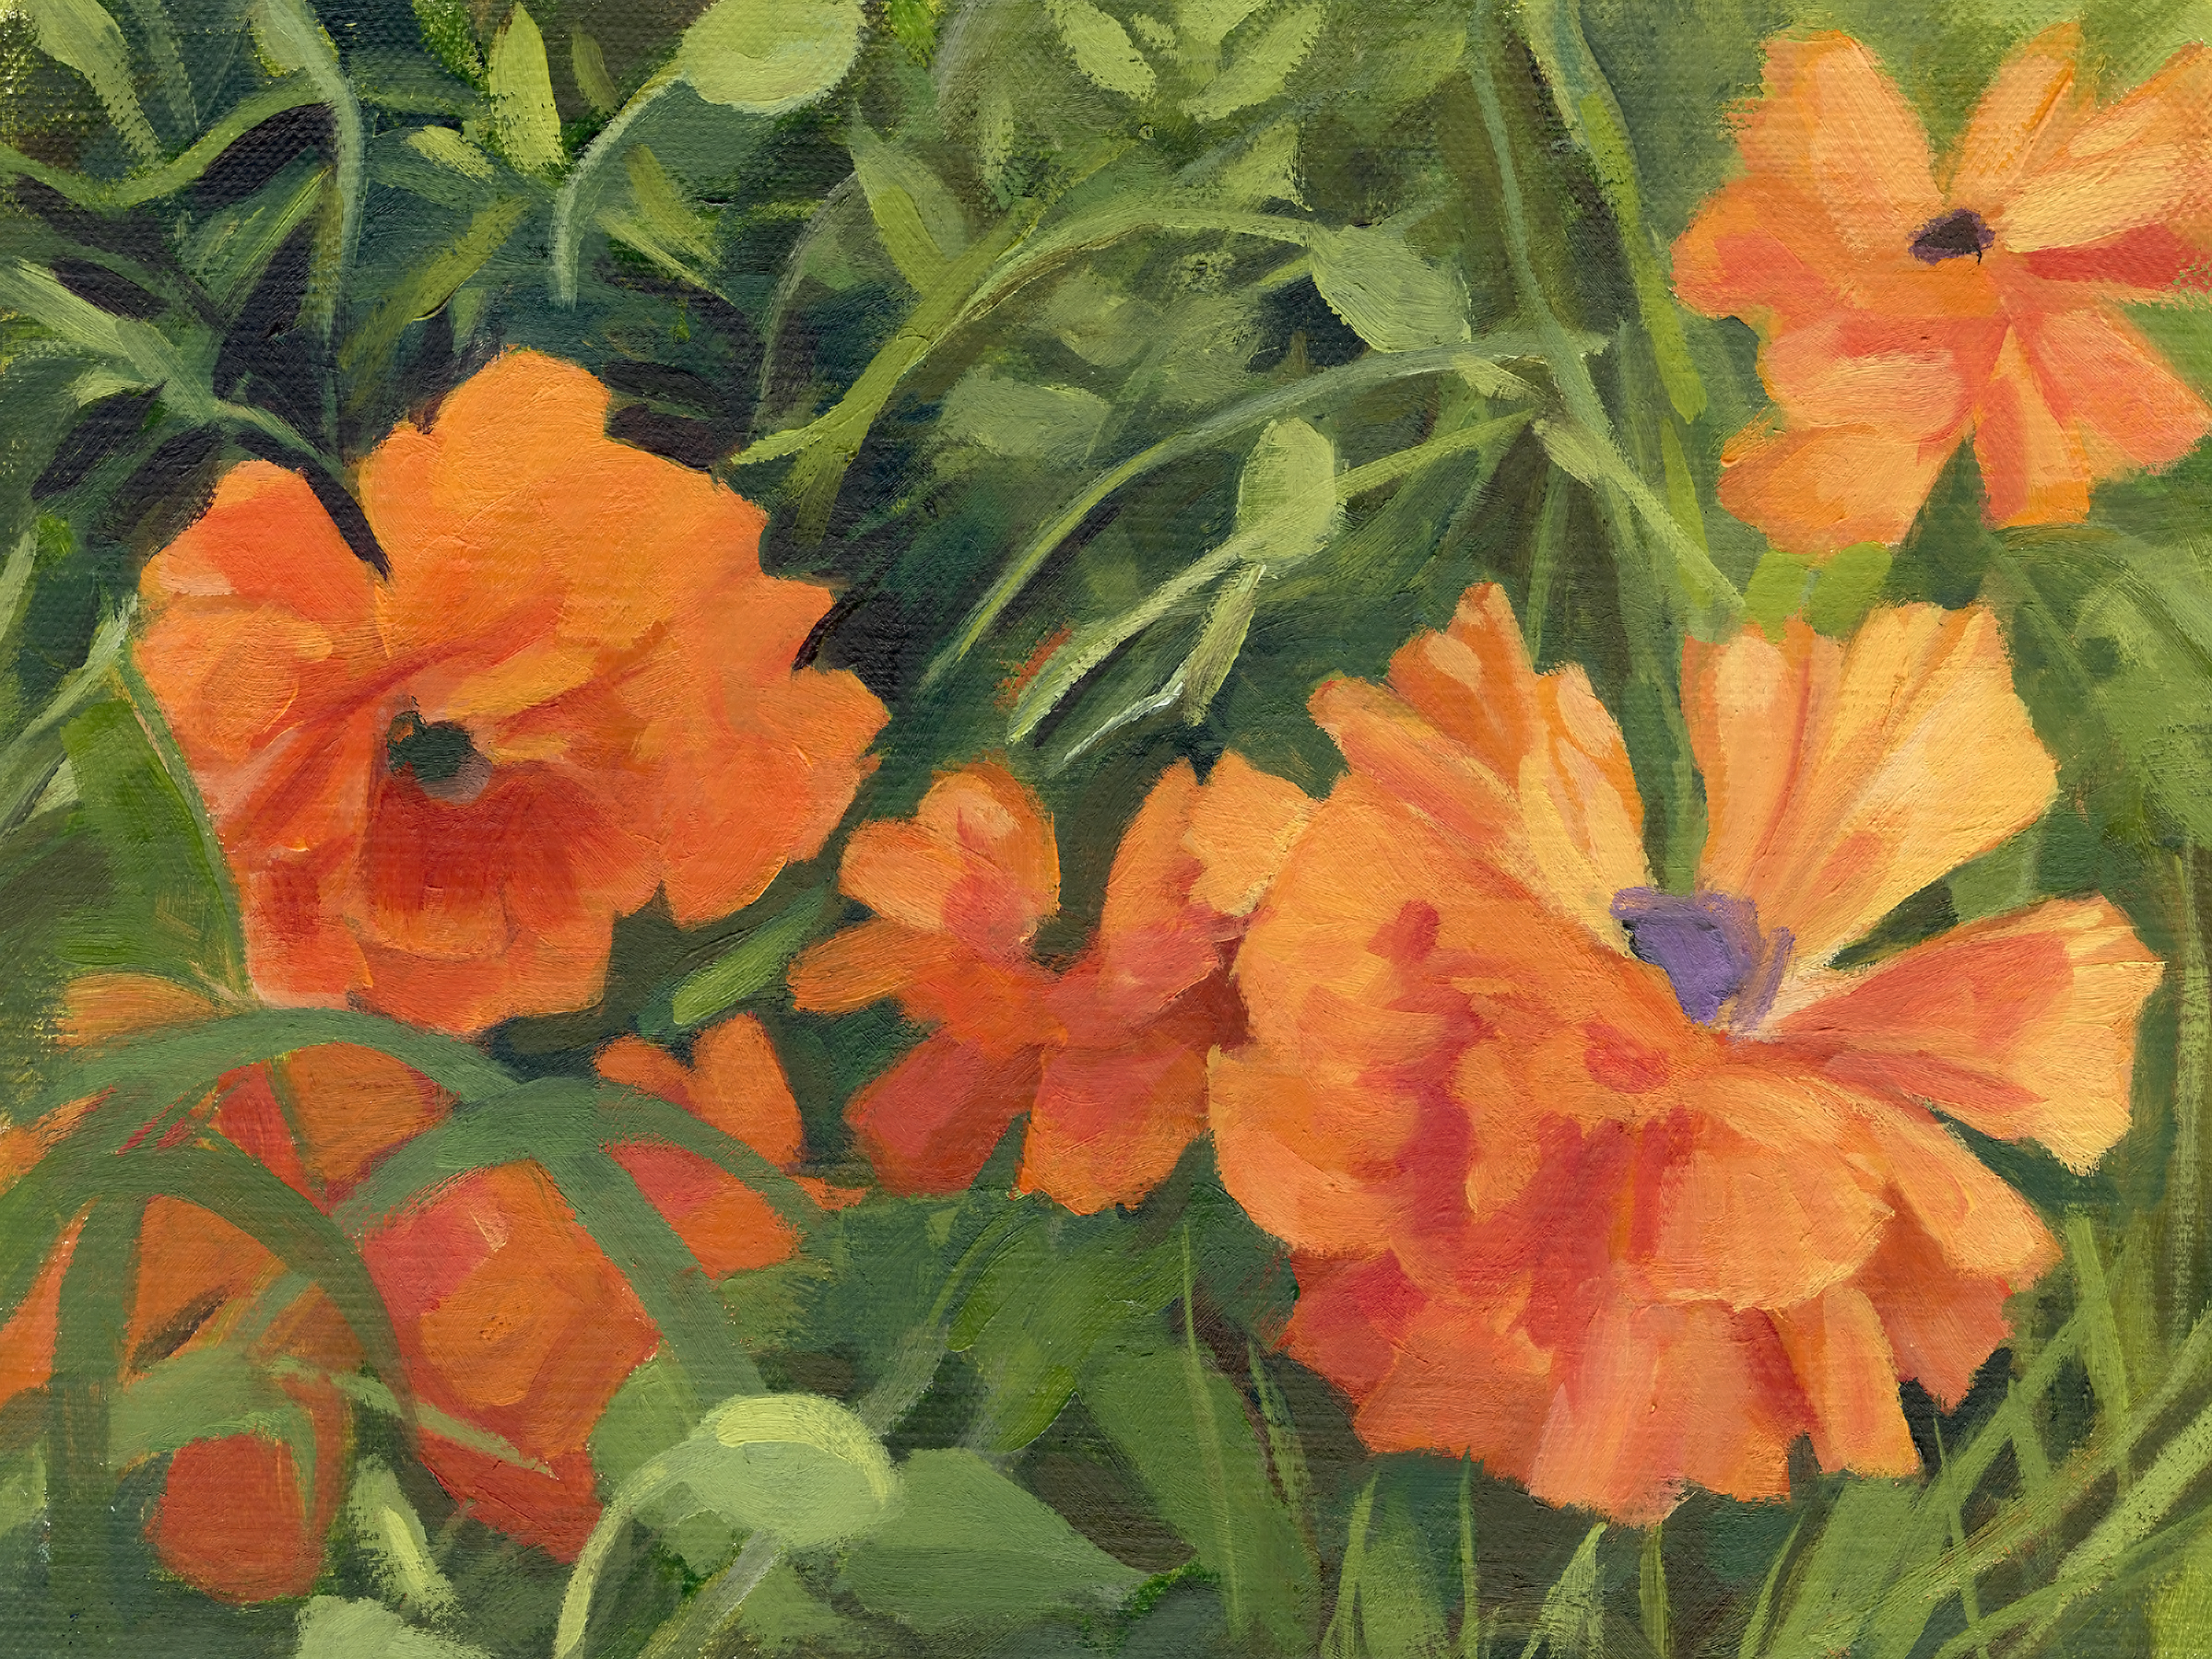 Field poppies. 8x6 oil painting on linen board. 2019